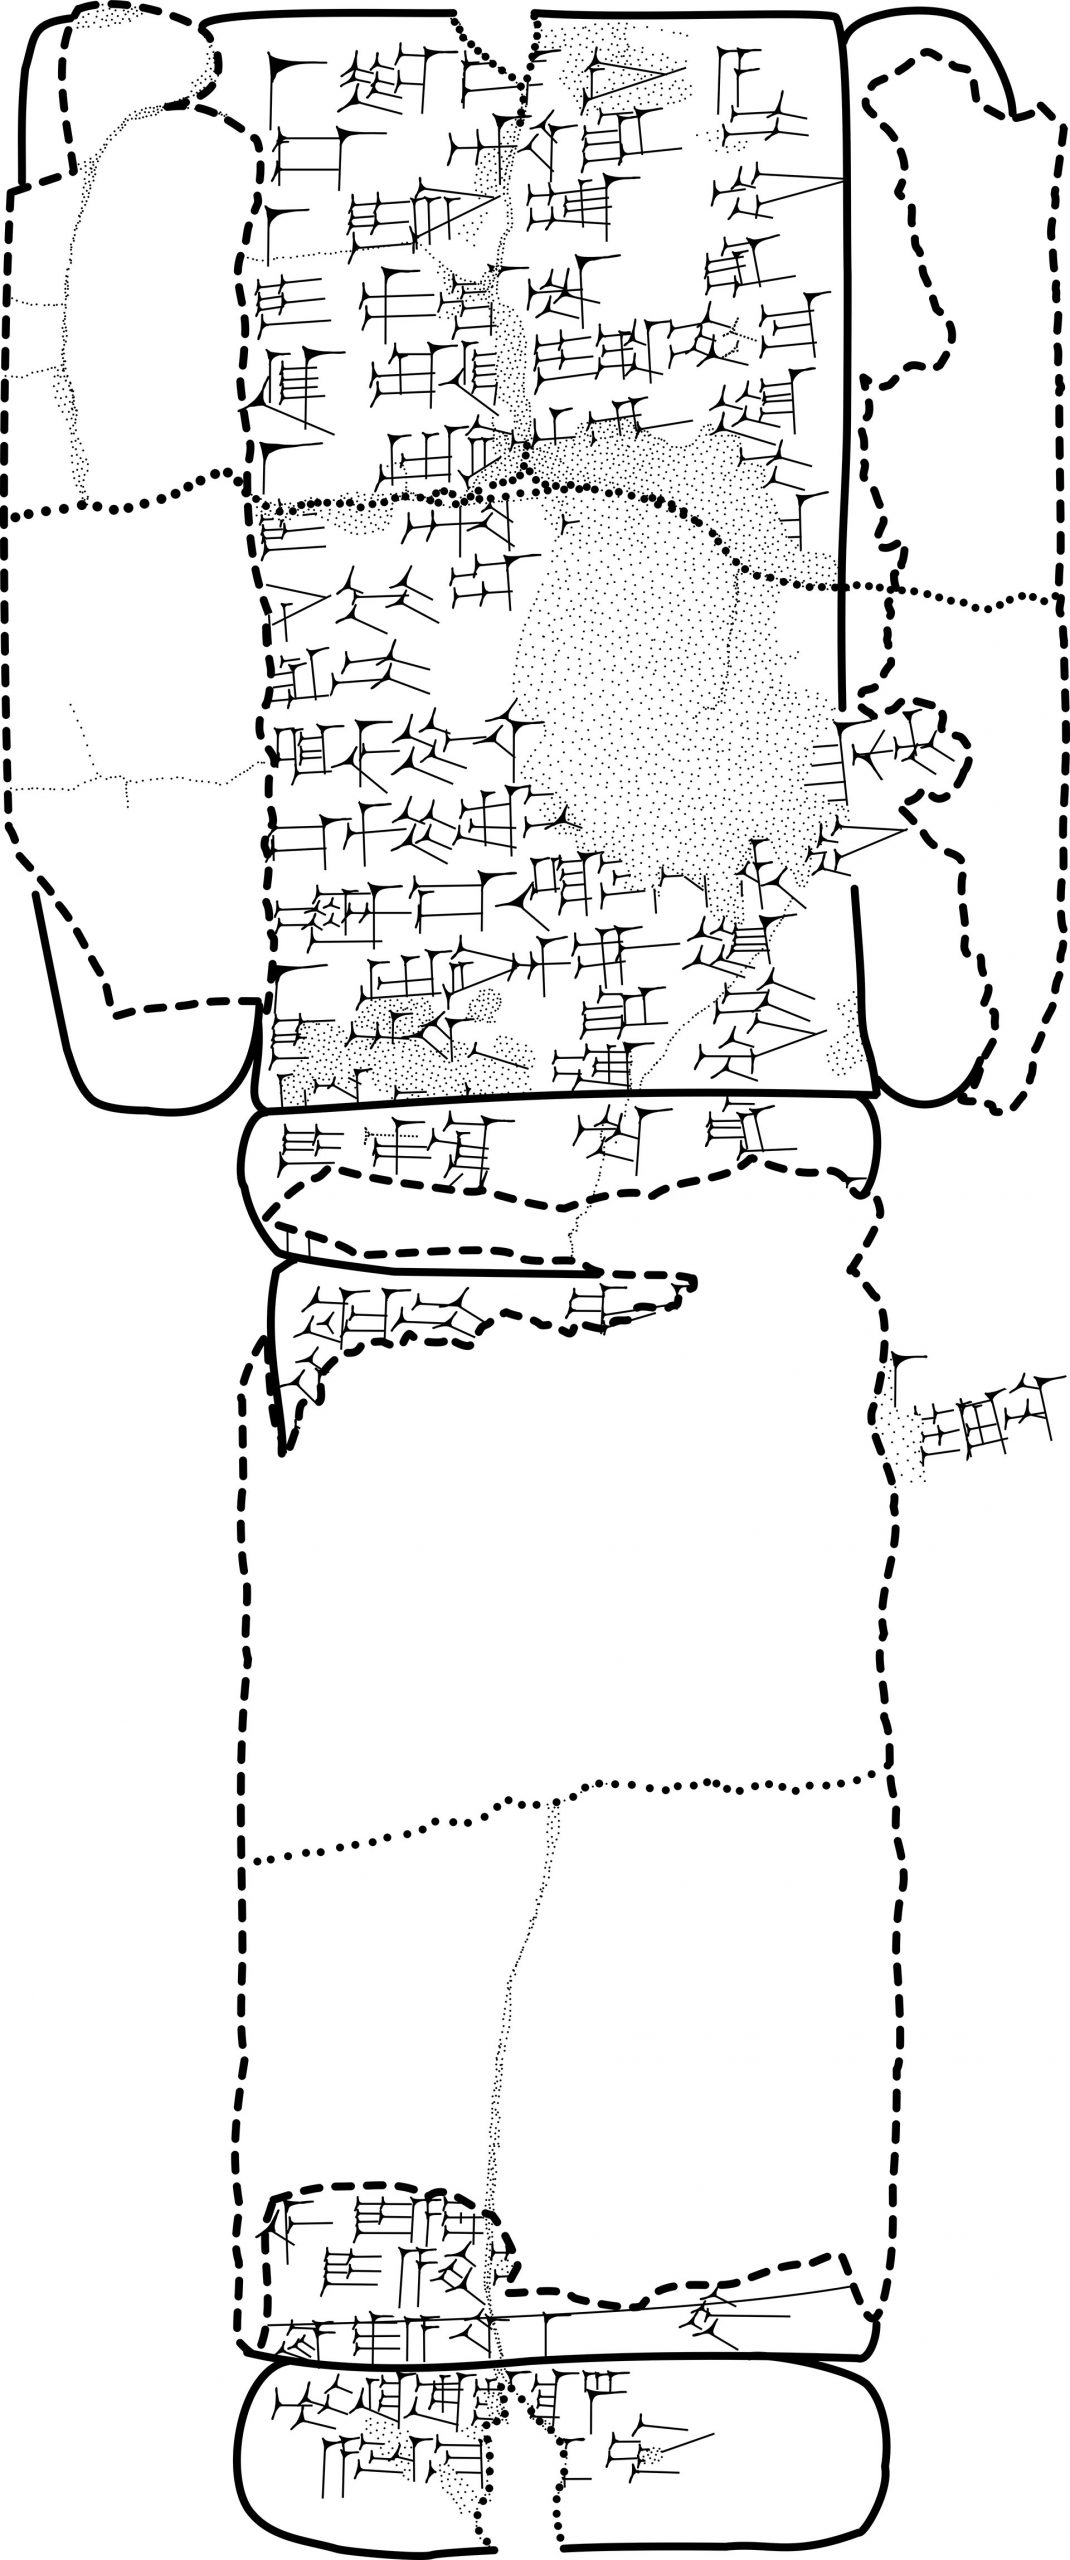 Cuneiform tablet drawing